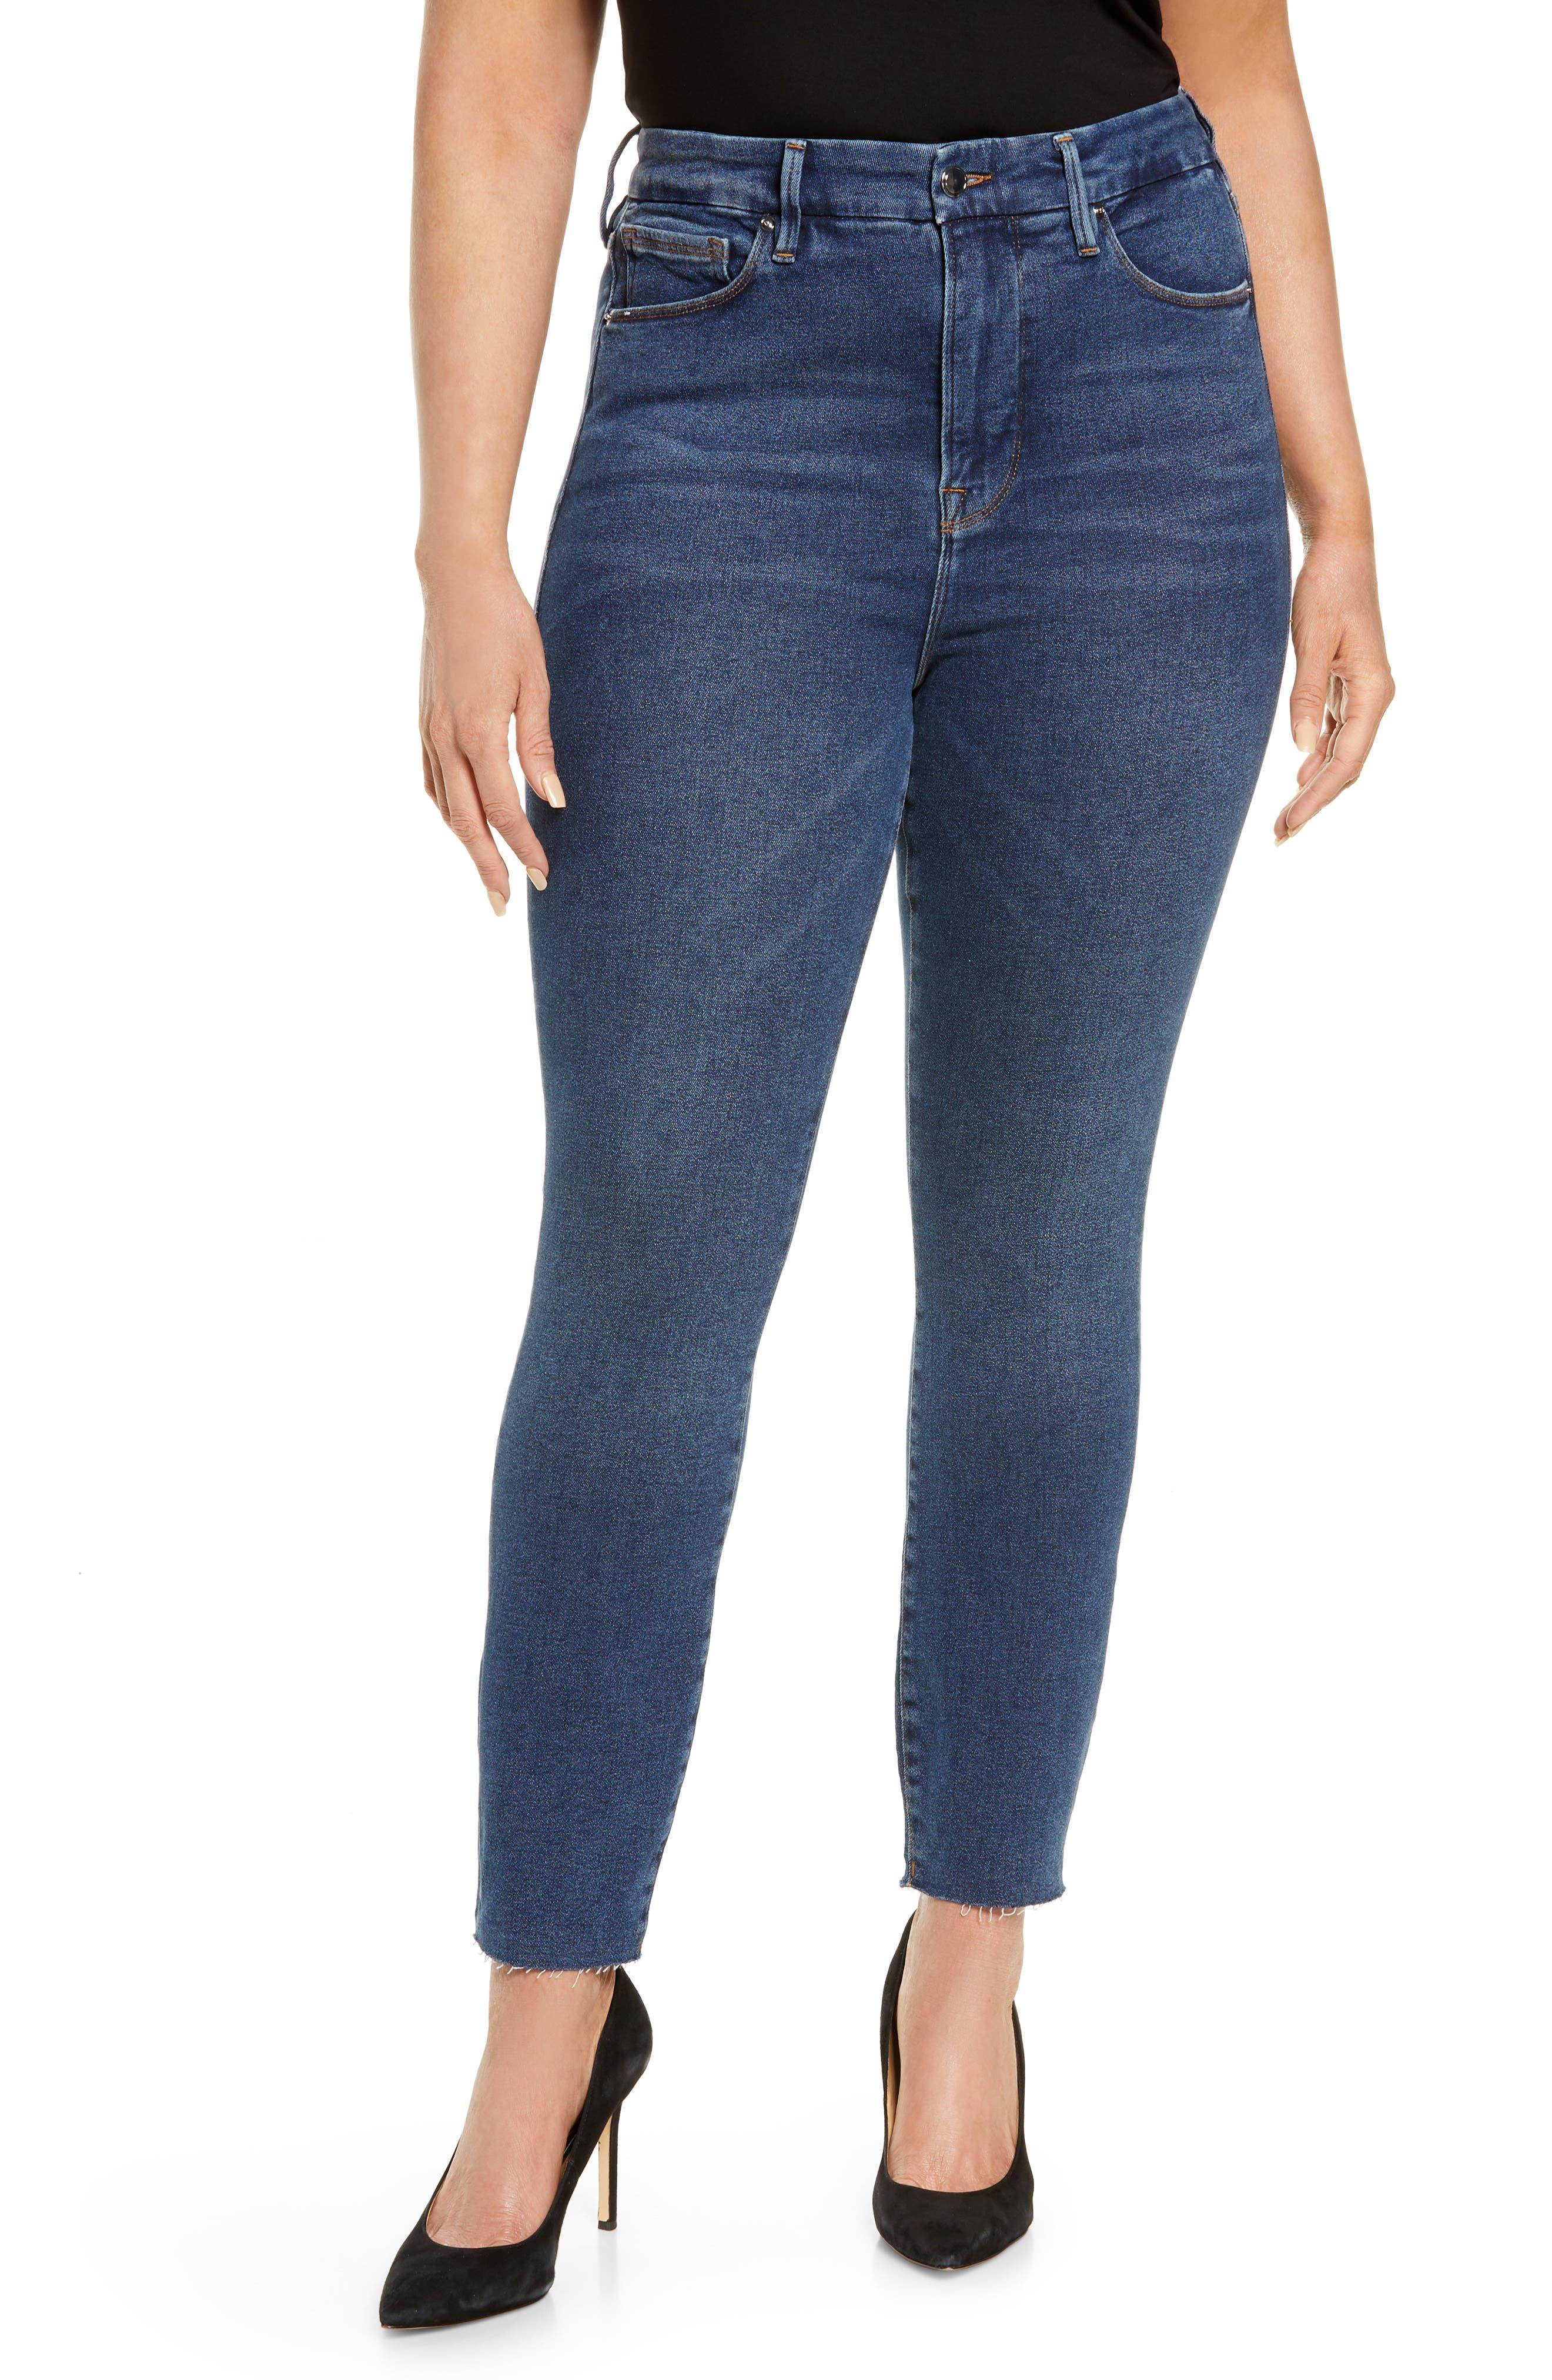 Image of Good American Good Legs Raw Edge Skinny Jeans